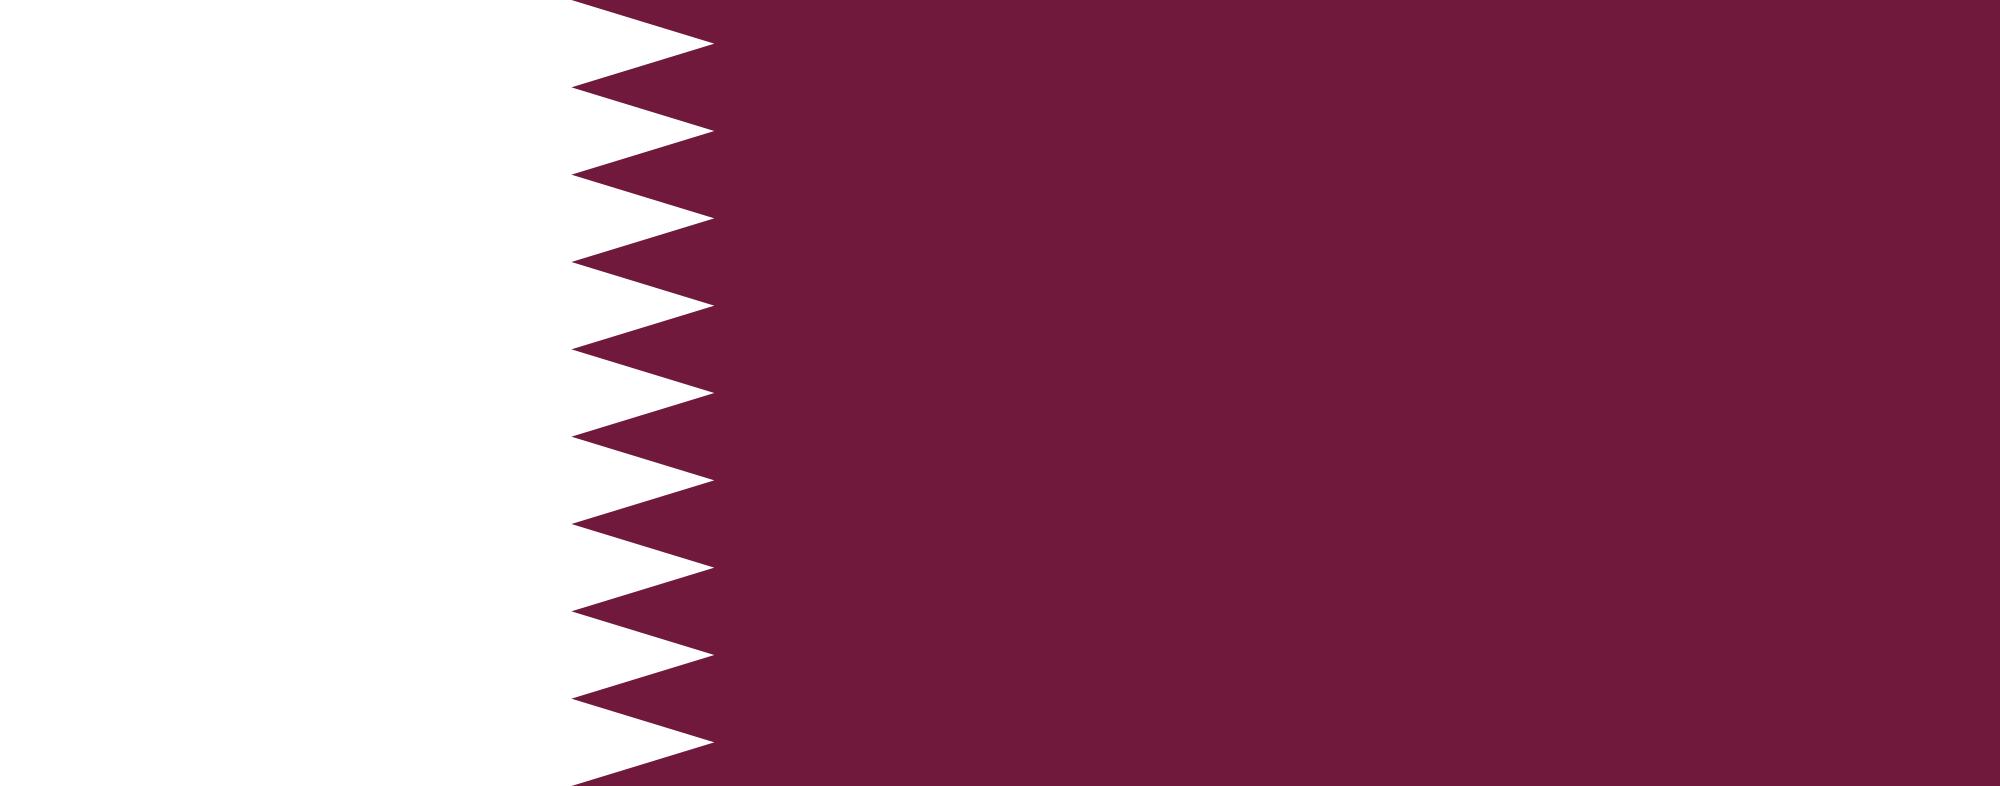 Qatar - bandera